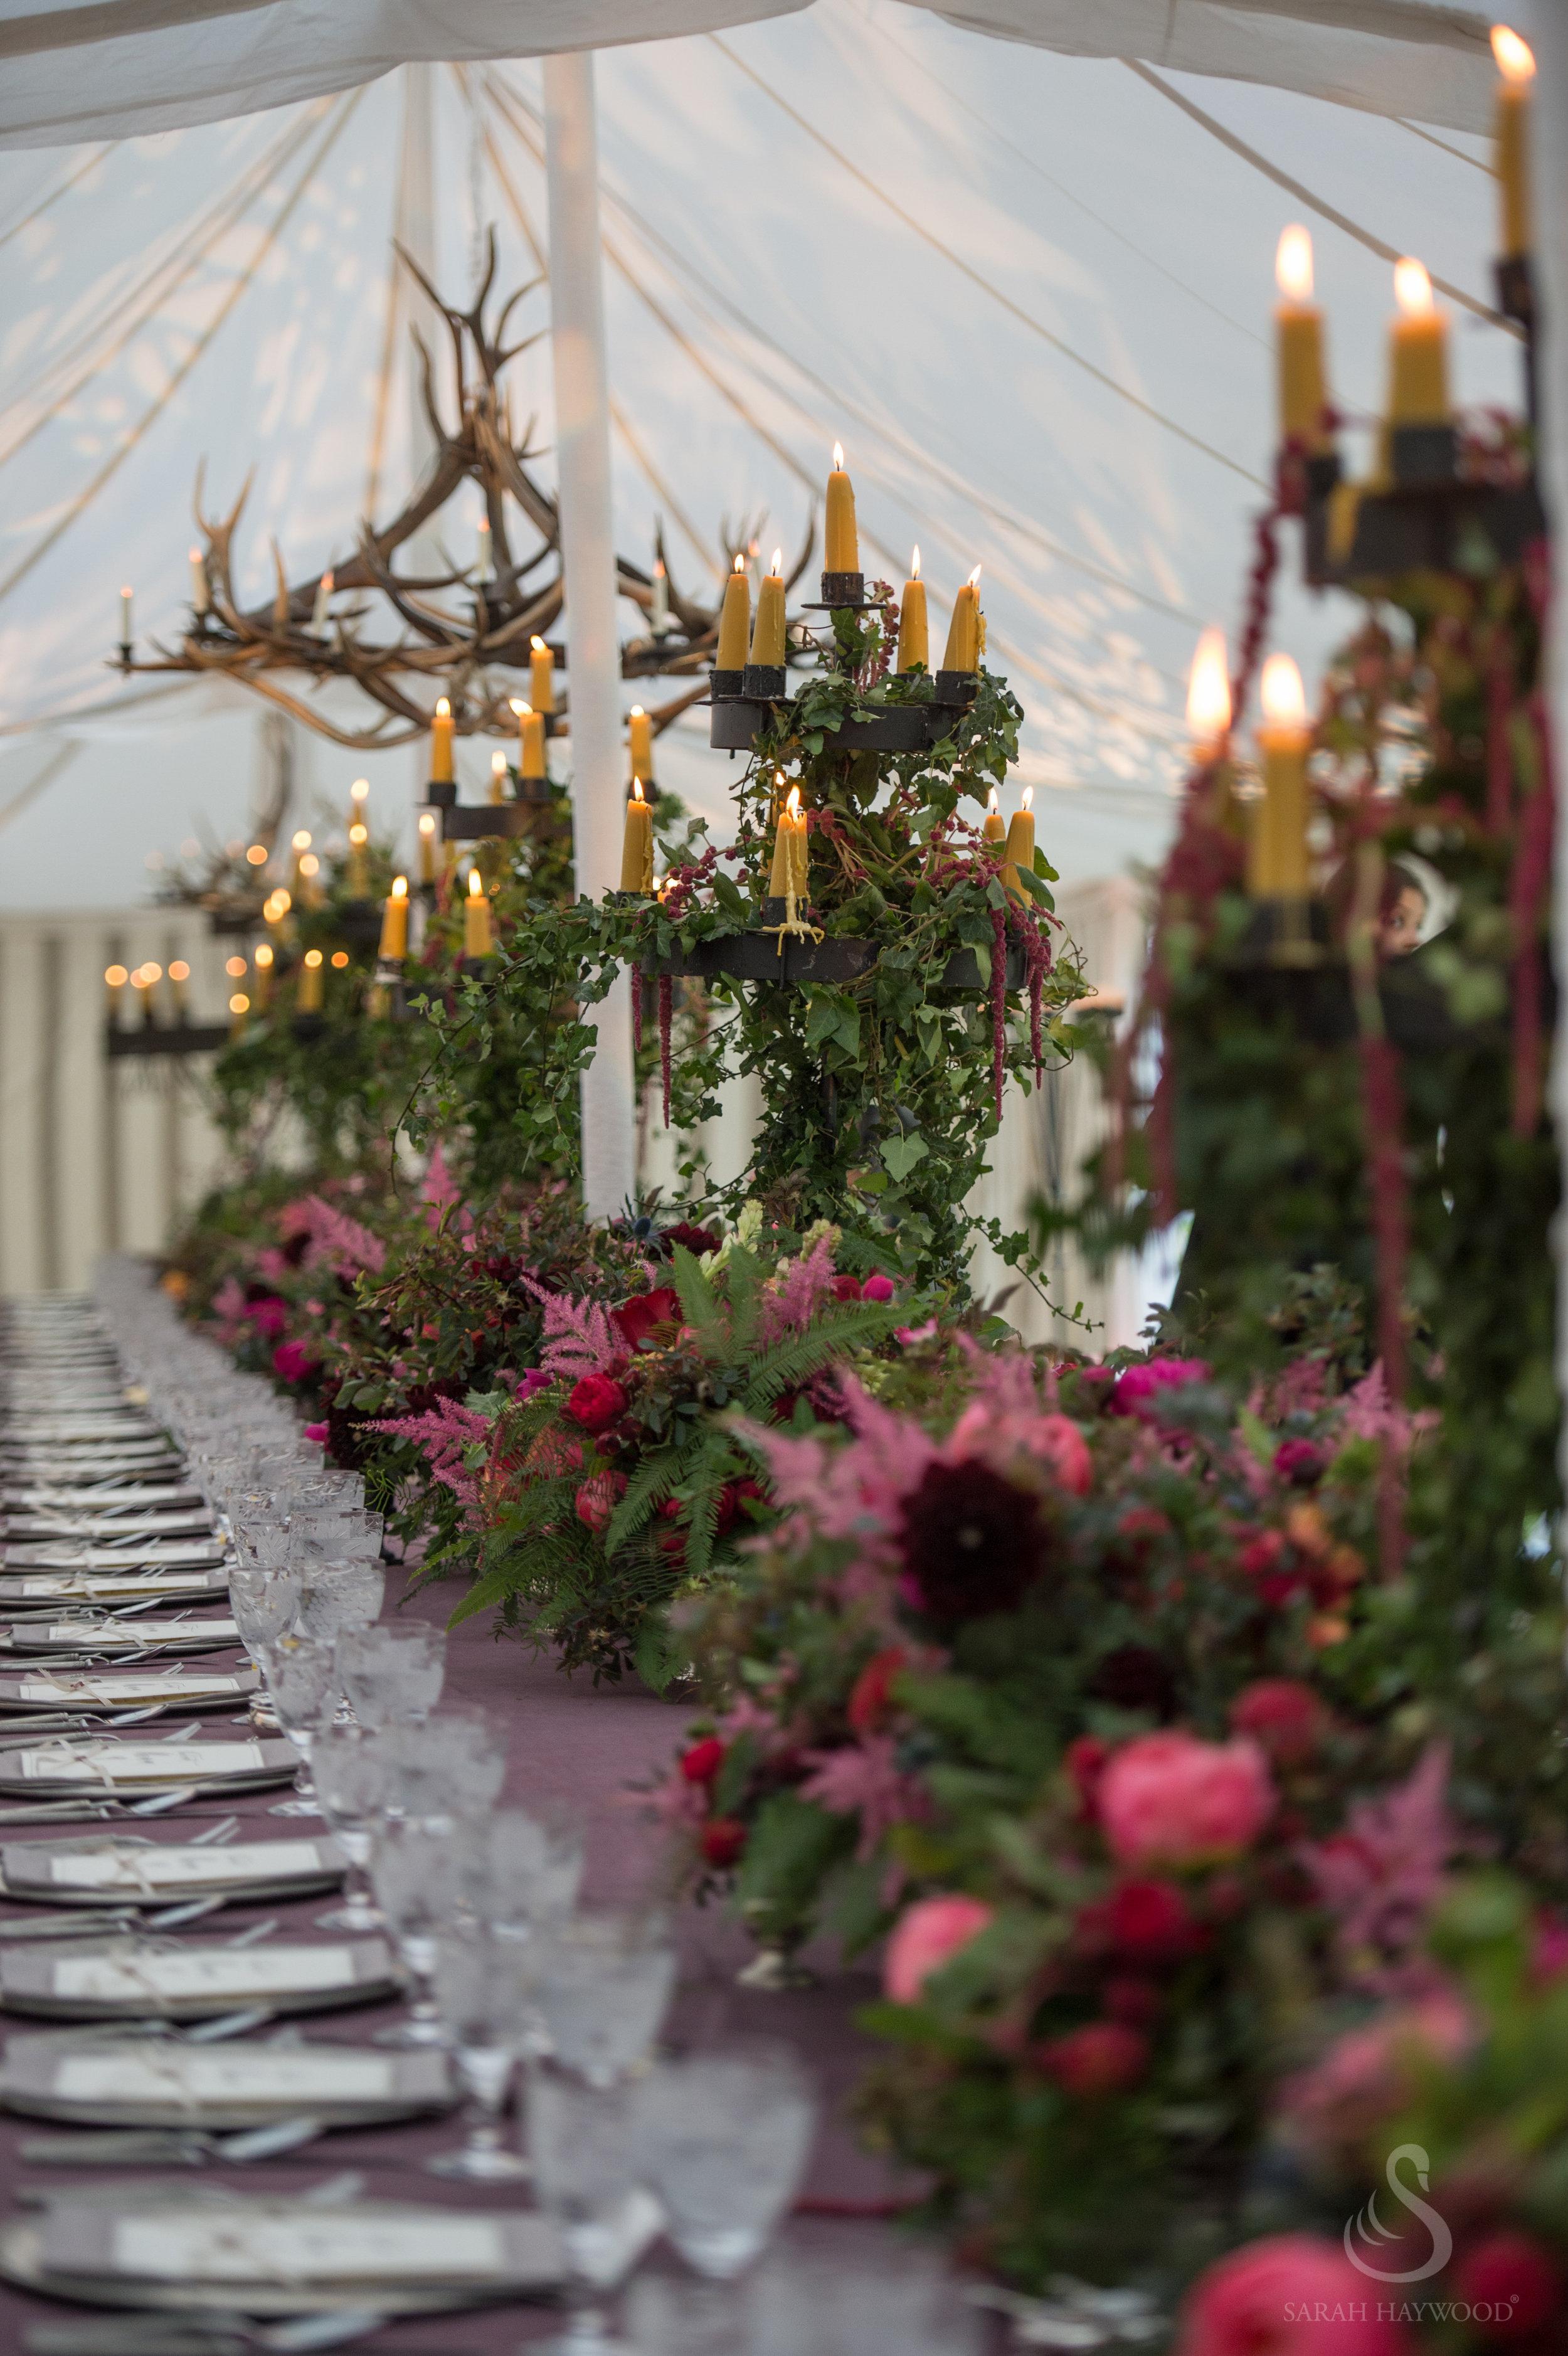 Scotland_Wedding_copyright_Carla Ten Eyck_for Sarah Haywood Wedding Design_887 copy.jpg